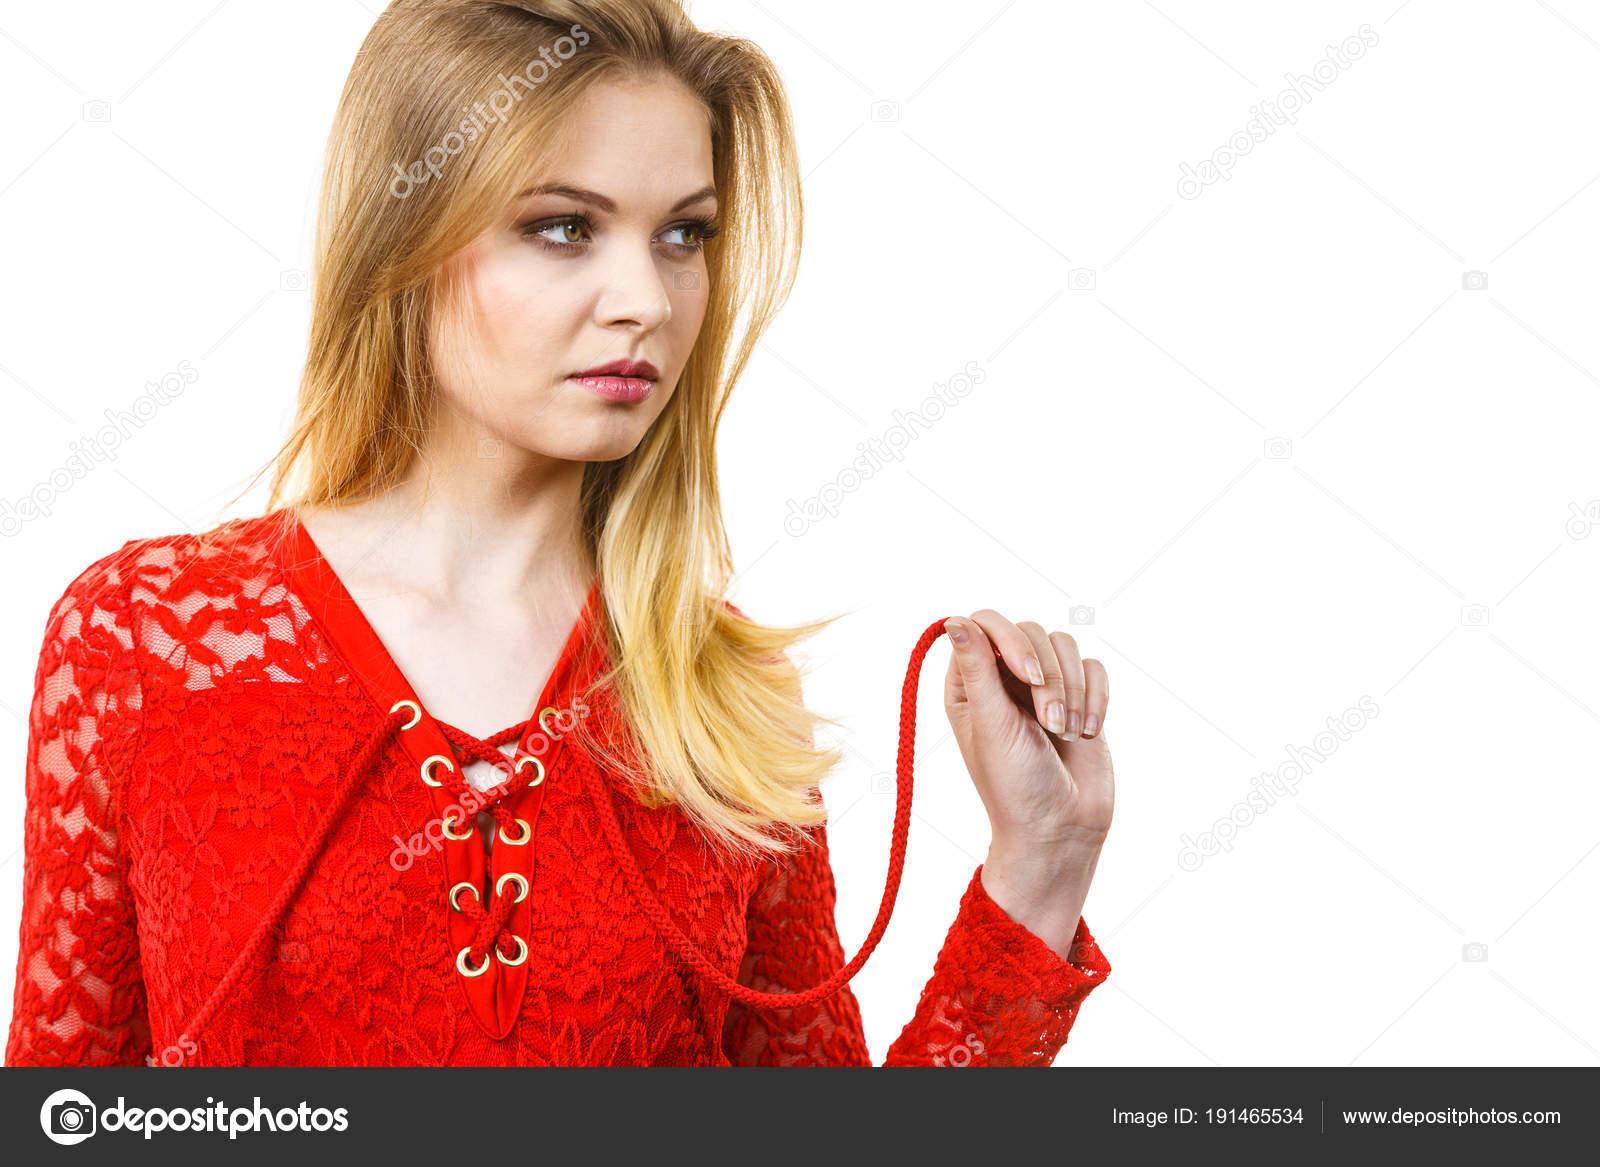 3c562f55434e83 Elegant young woman wearing red top — Stock Photo © Anetlanda #191465534